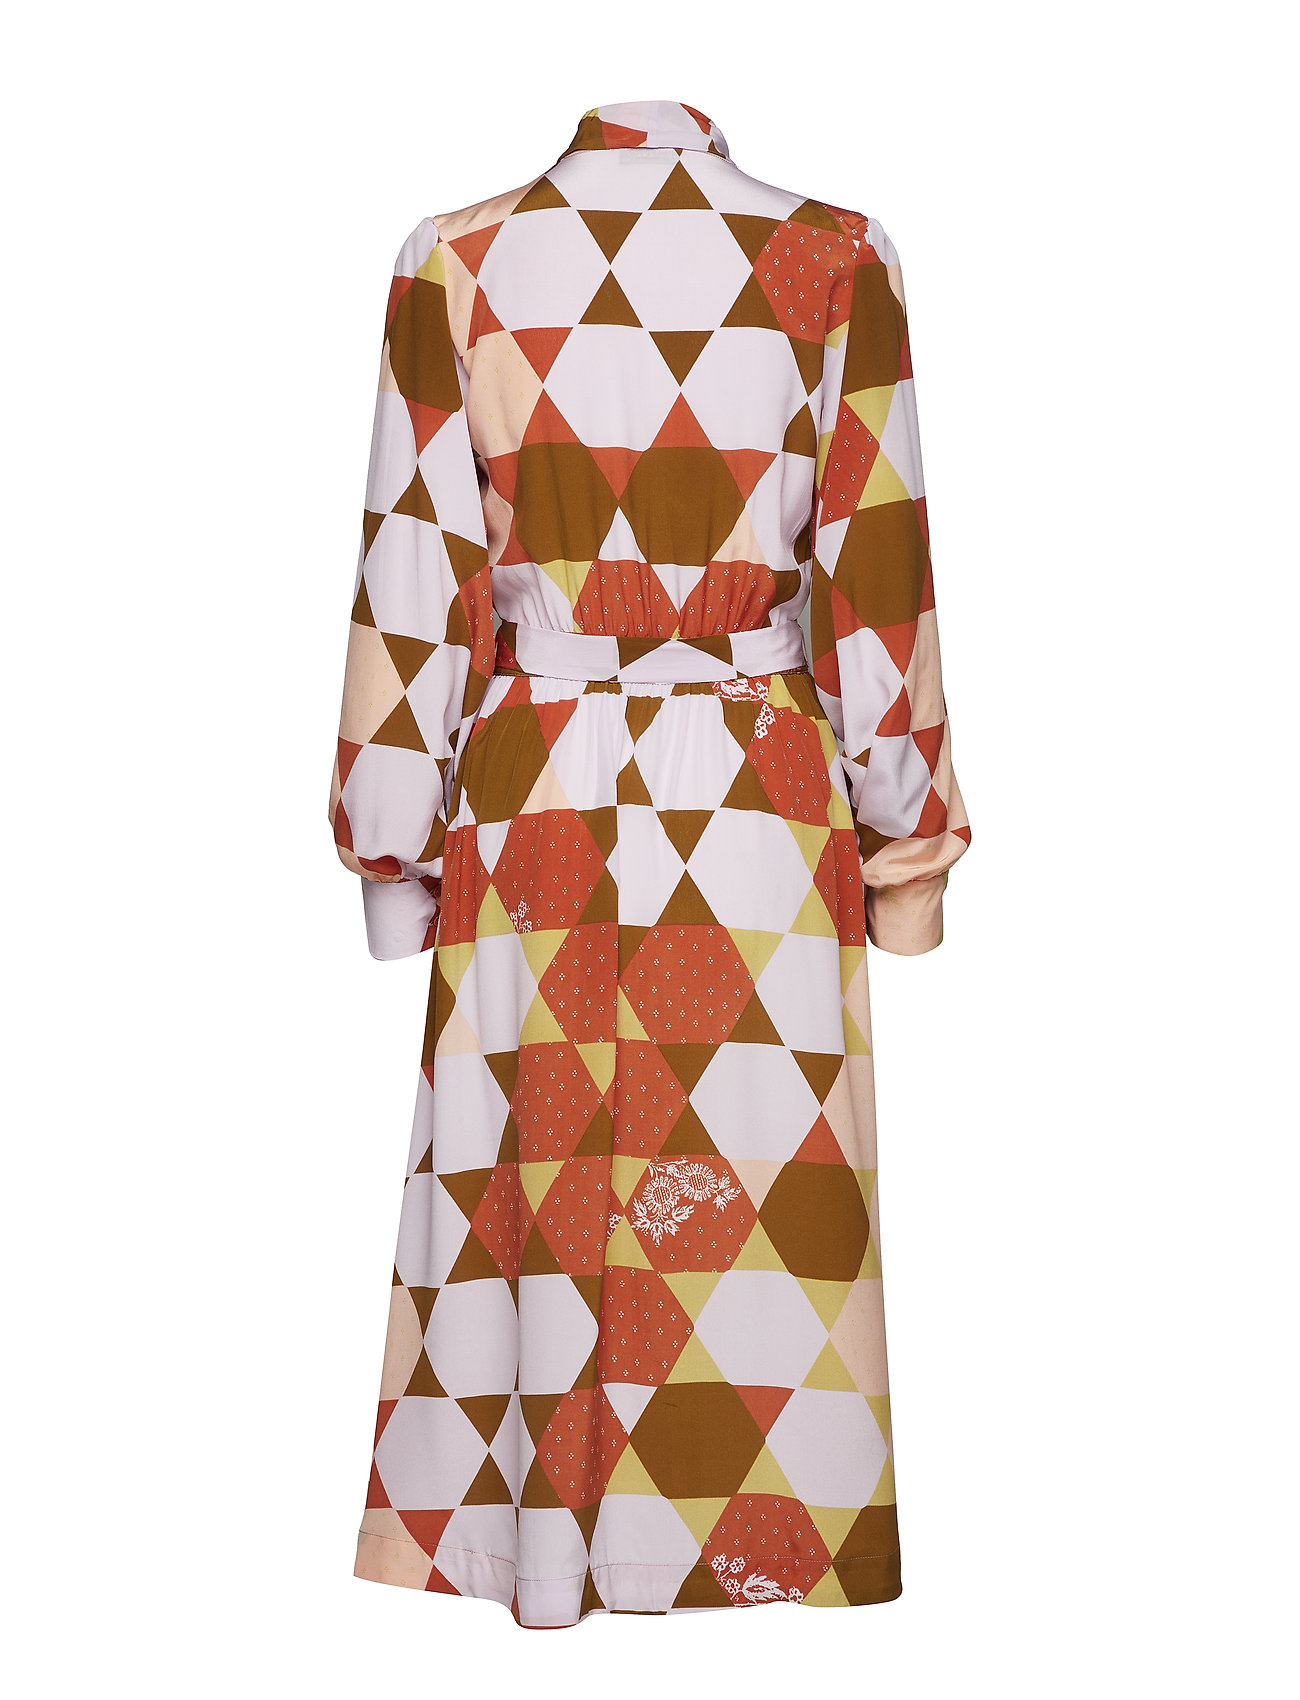 Micaela420 SoftStine Goya Hexagons Silkhexagons WI29DHeEY